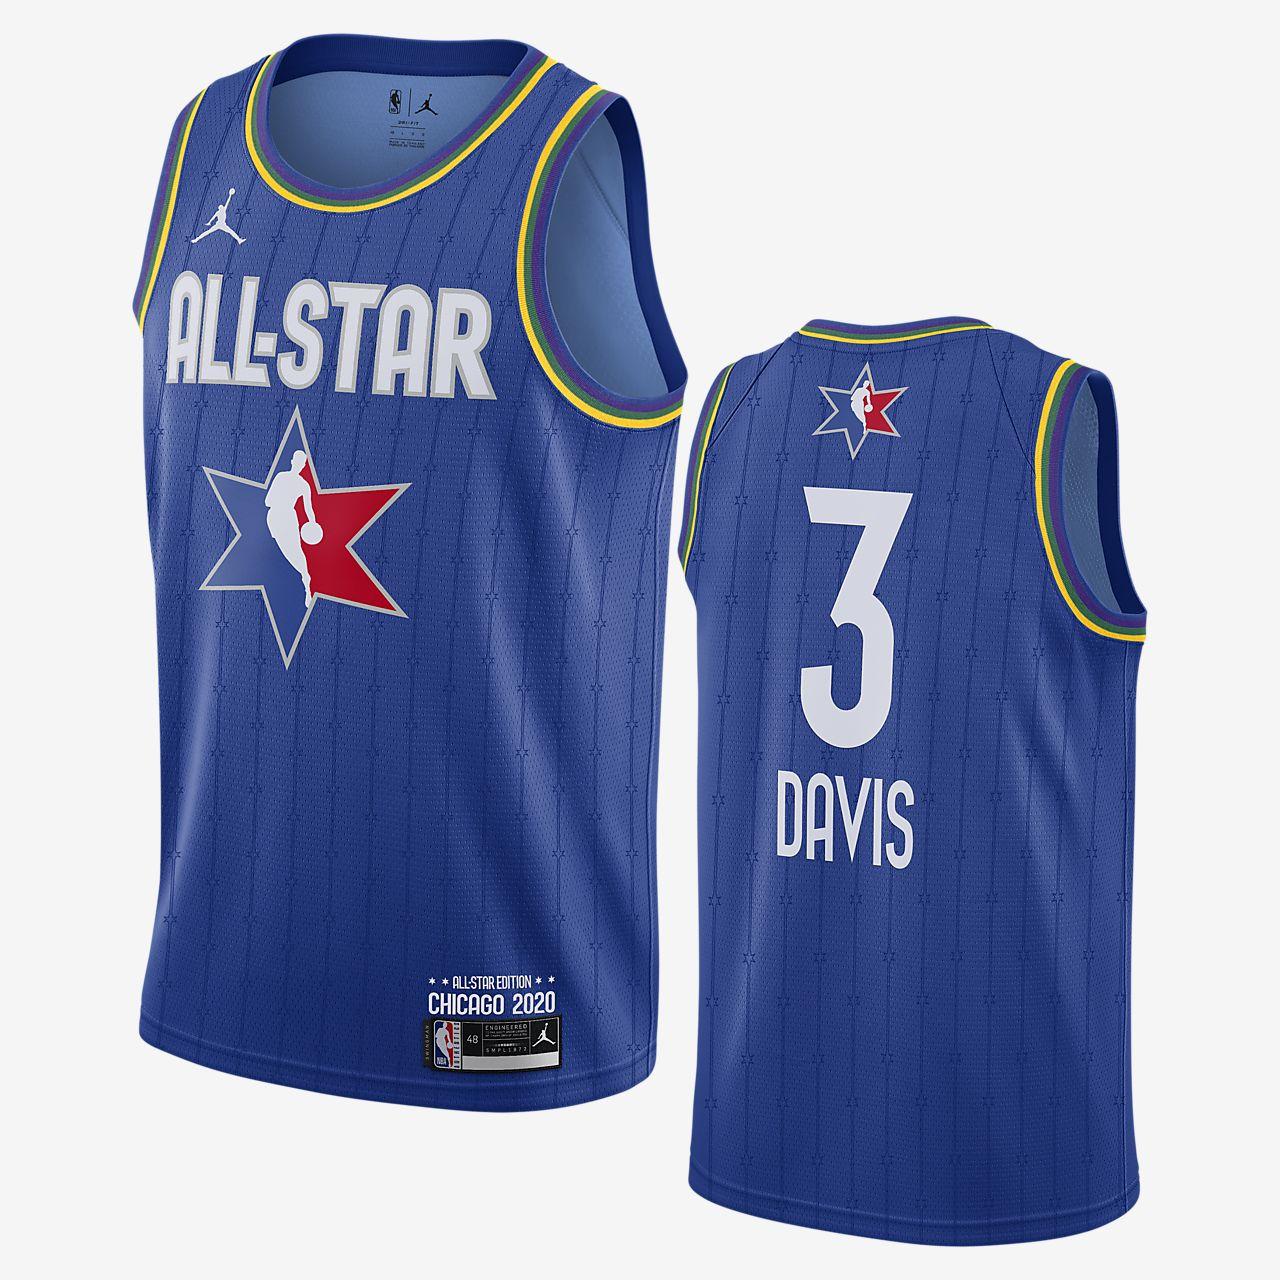 Anthony Davis All-Star Jordan NBA Swingman Jersey 男子球衣